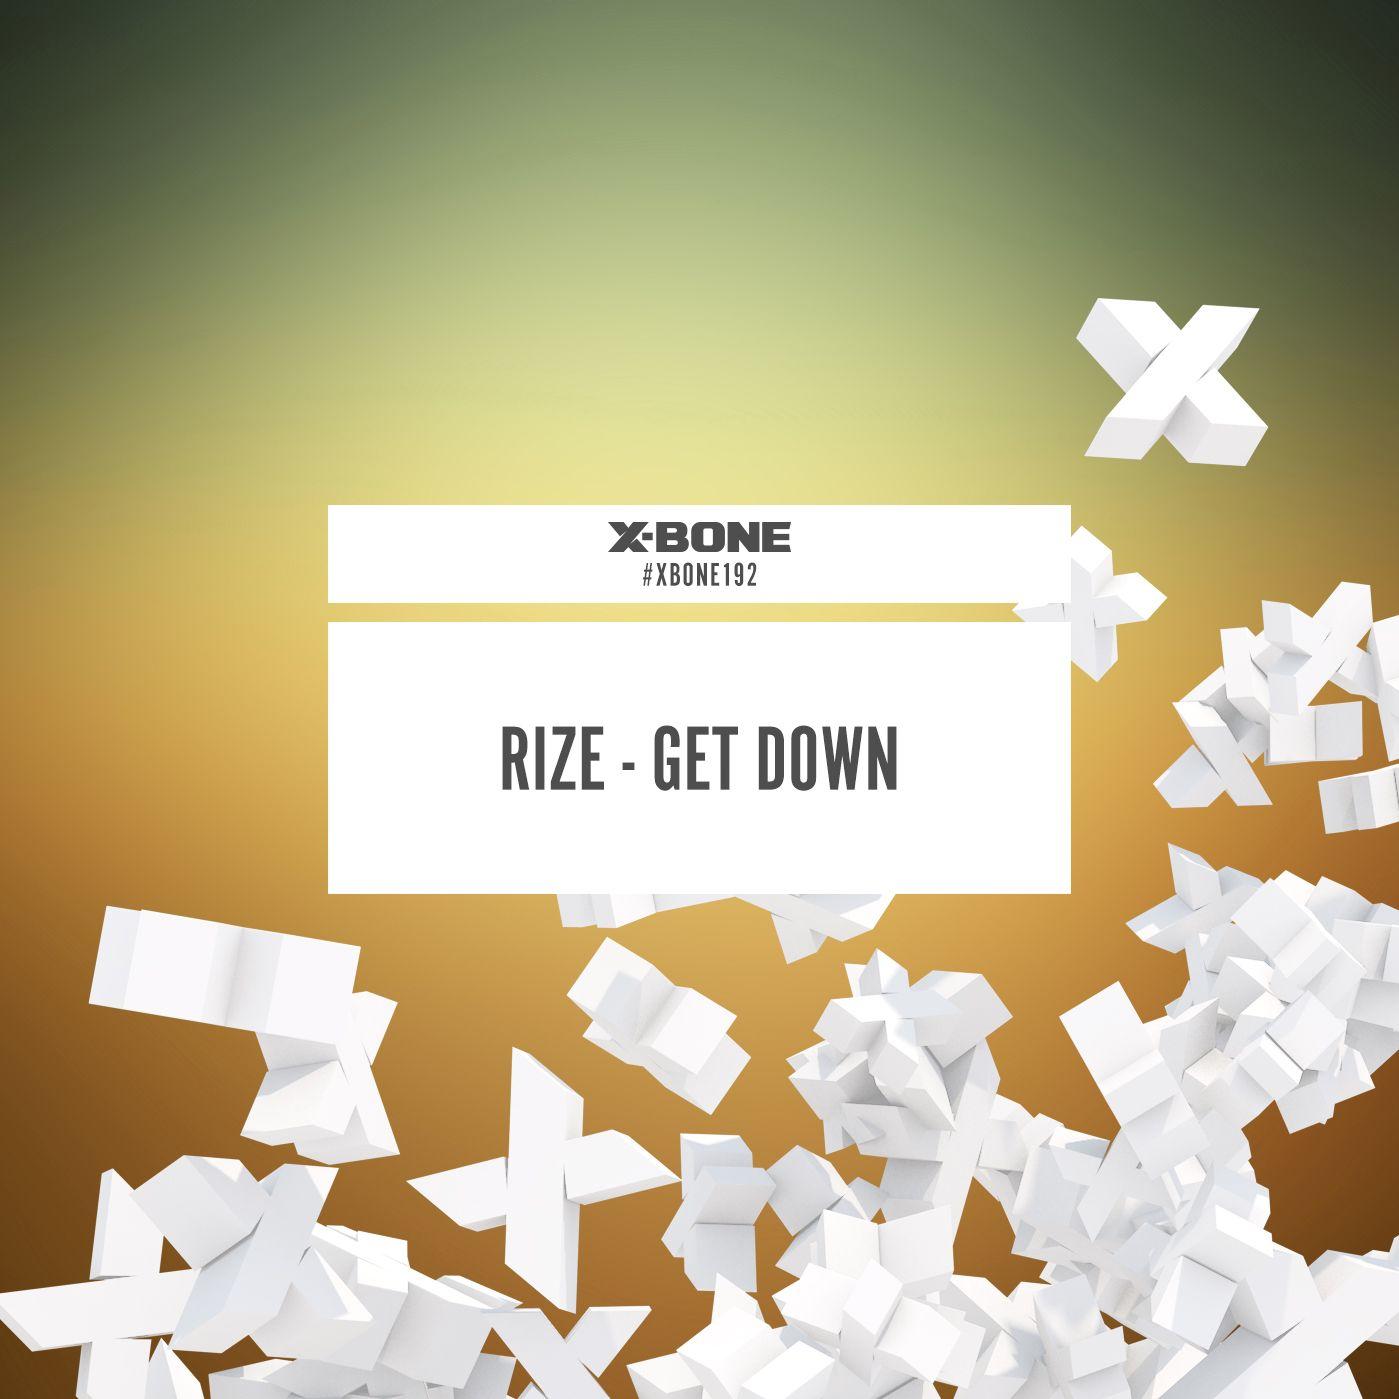 Rize - Get Down [X-BONE RECORDS] XBONE192